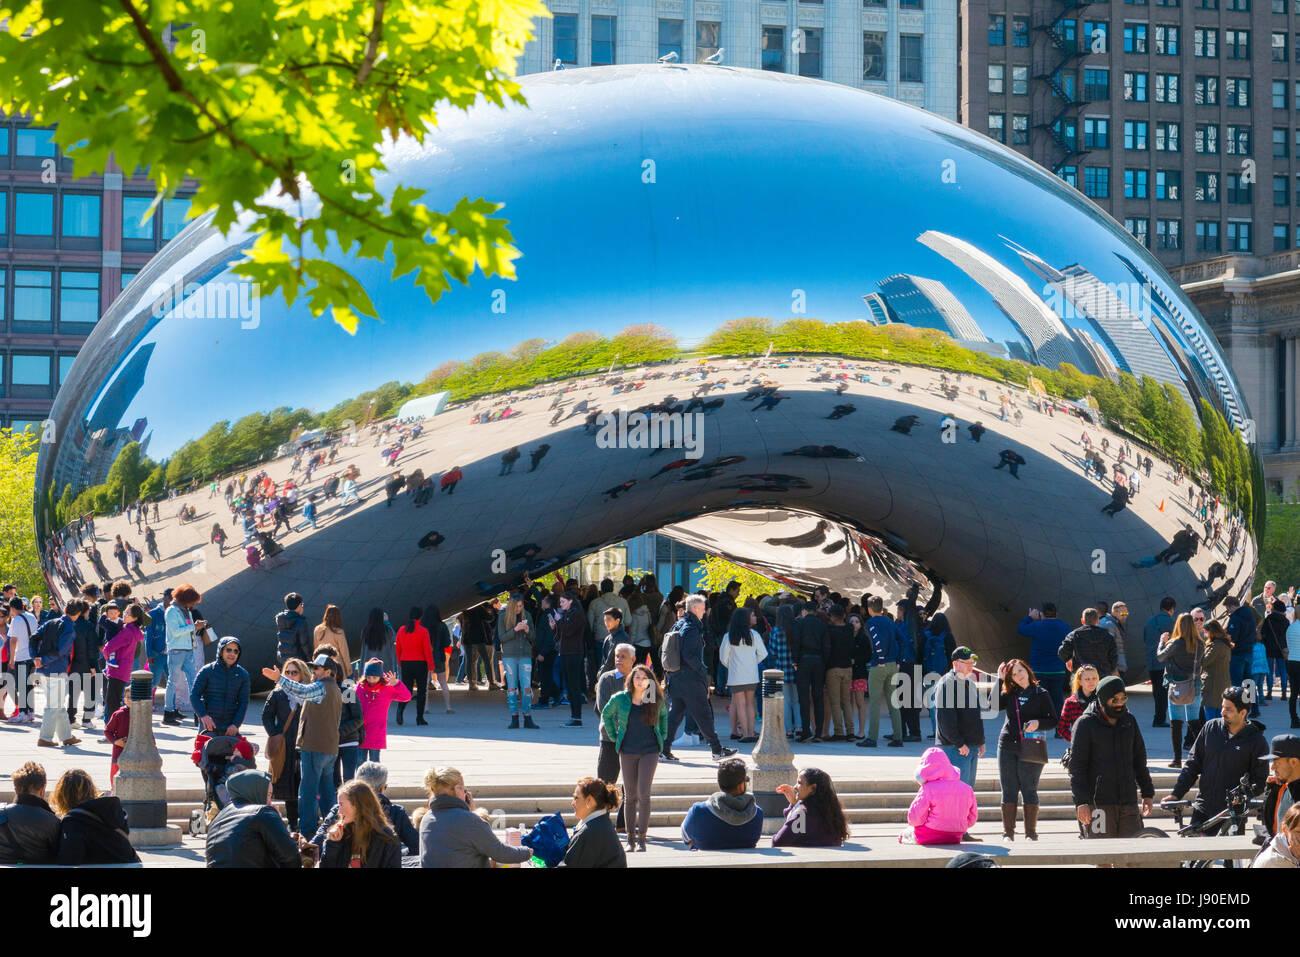 Chicago Illinois AT&T Plaza Millennium Park Cloud Gate The Bean sculpture British Sculptor Anish Kapoor polished - Stock Image